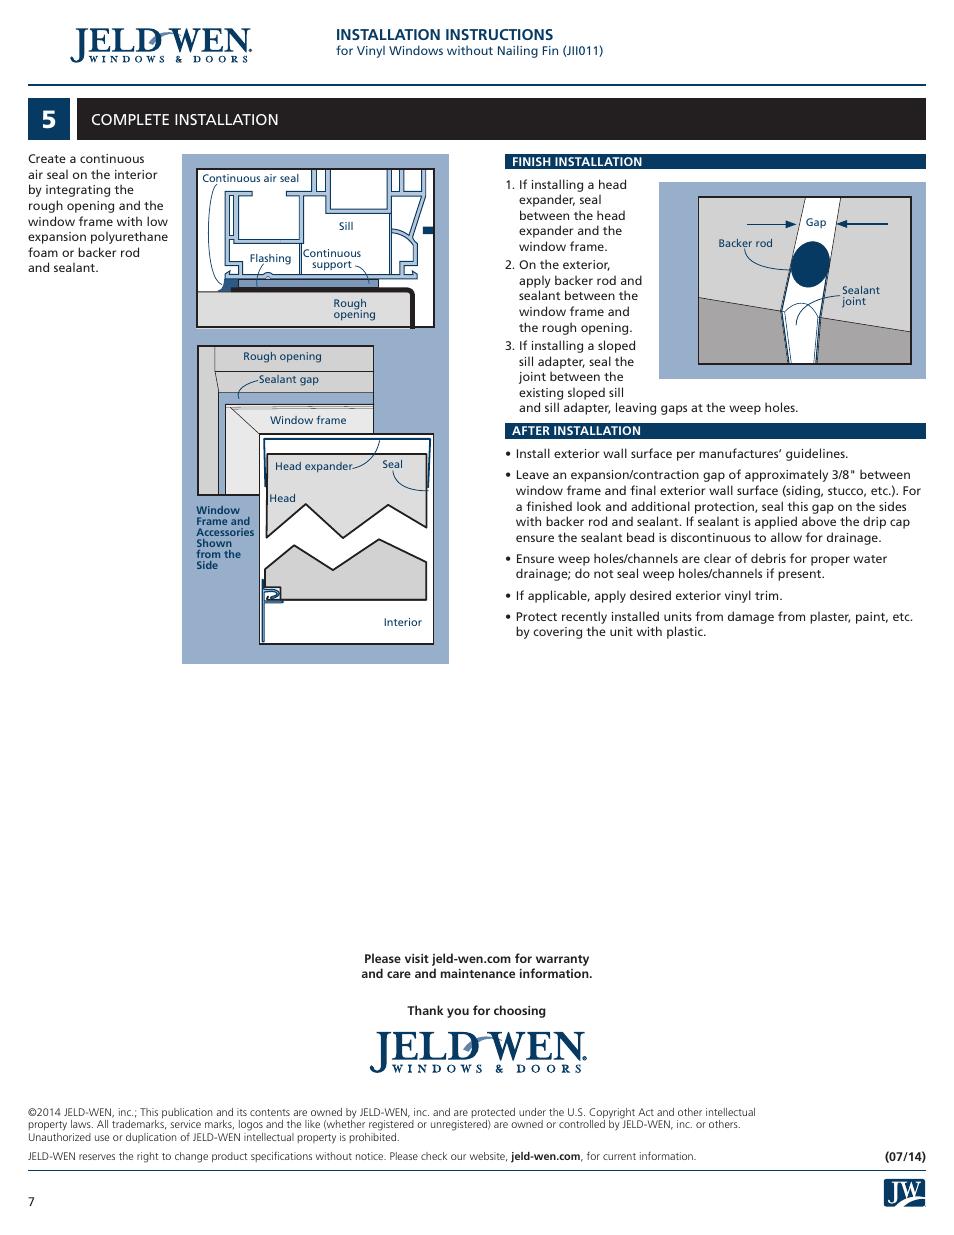 Installation instructions, Complete installation   JELD-WEN